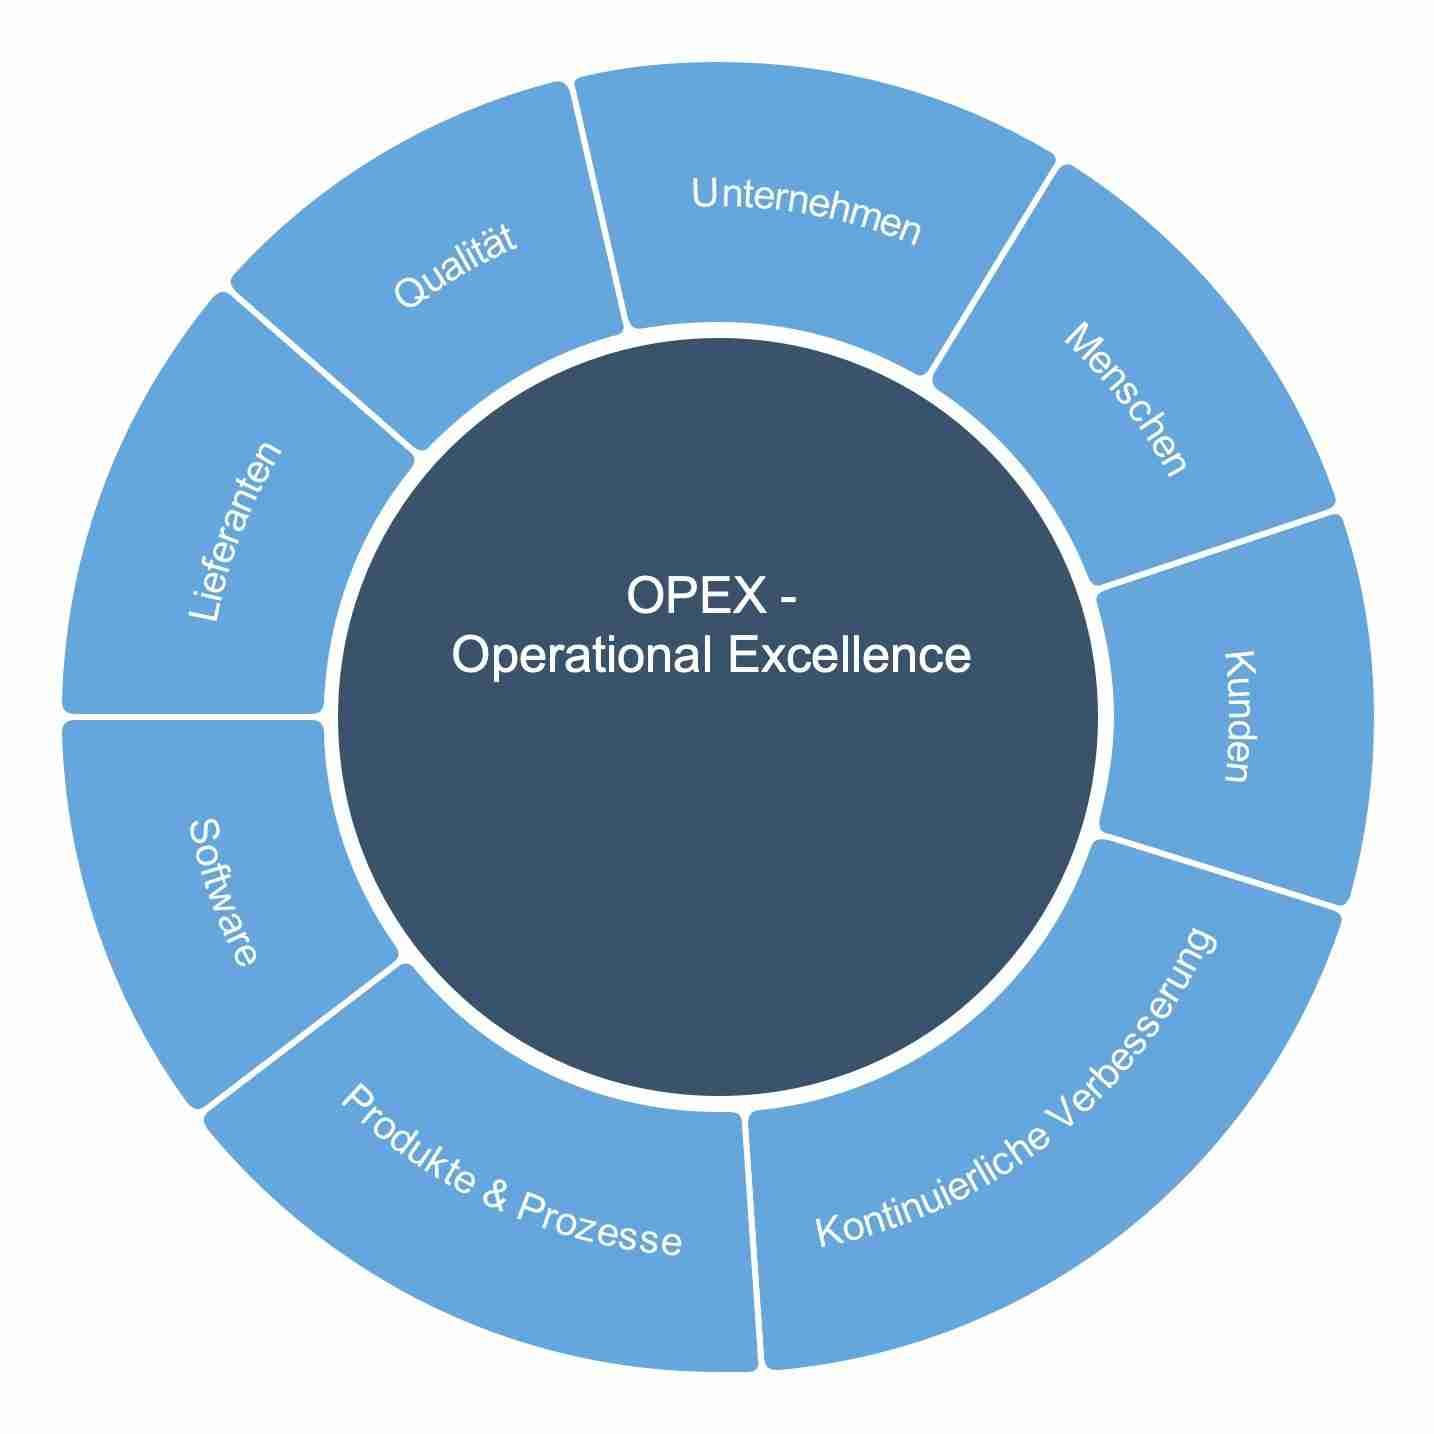 opex operational excellence qulitat